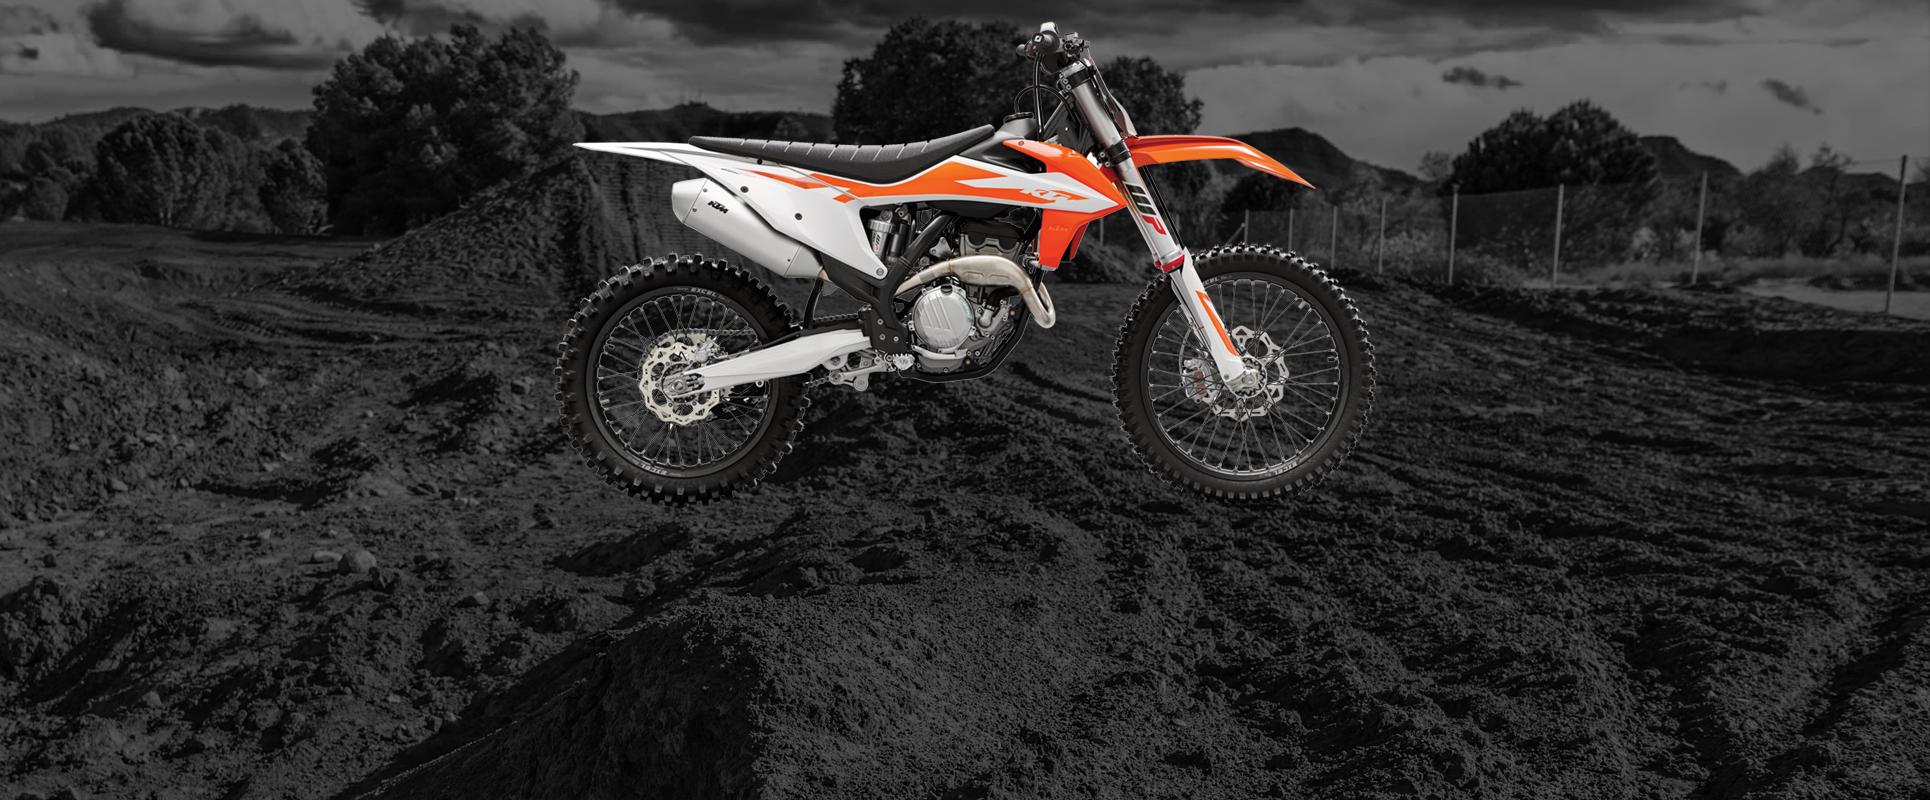 Drysdale Motorcycles | KTM Dealer Scotland